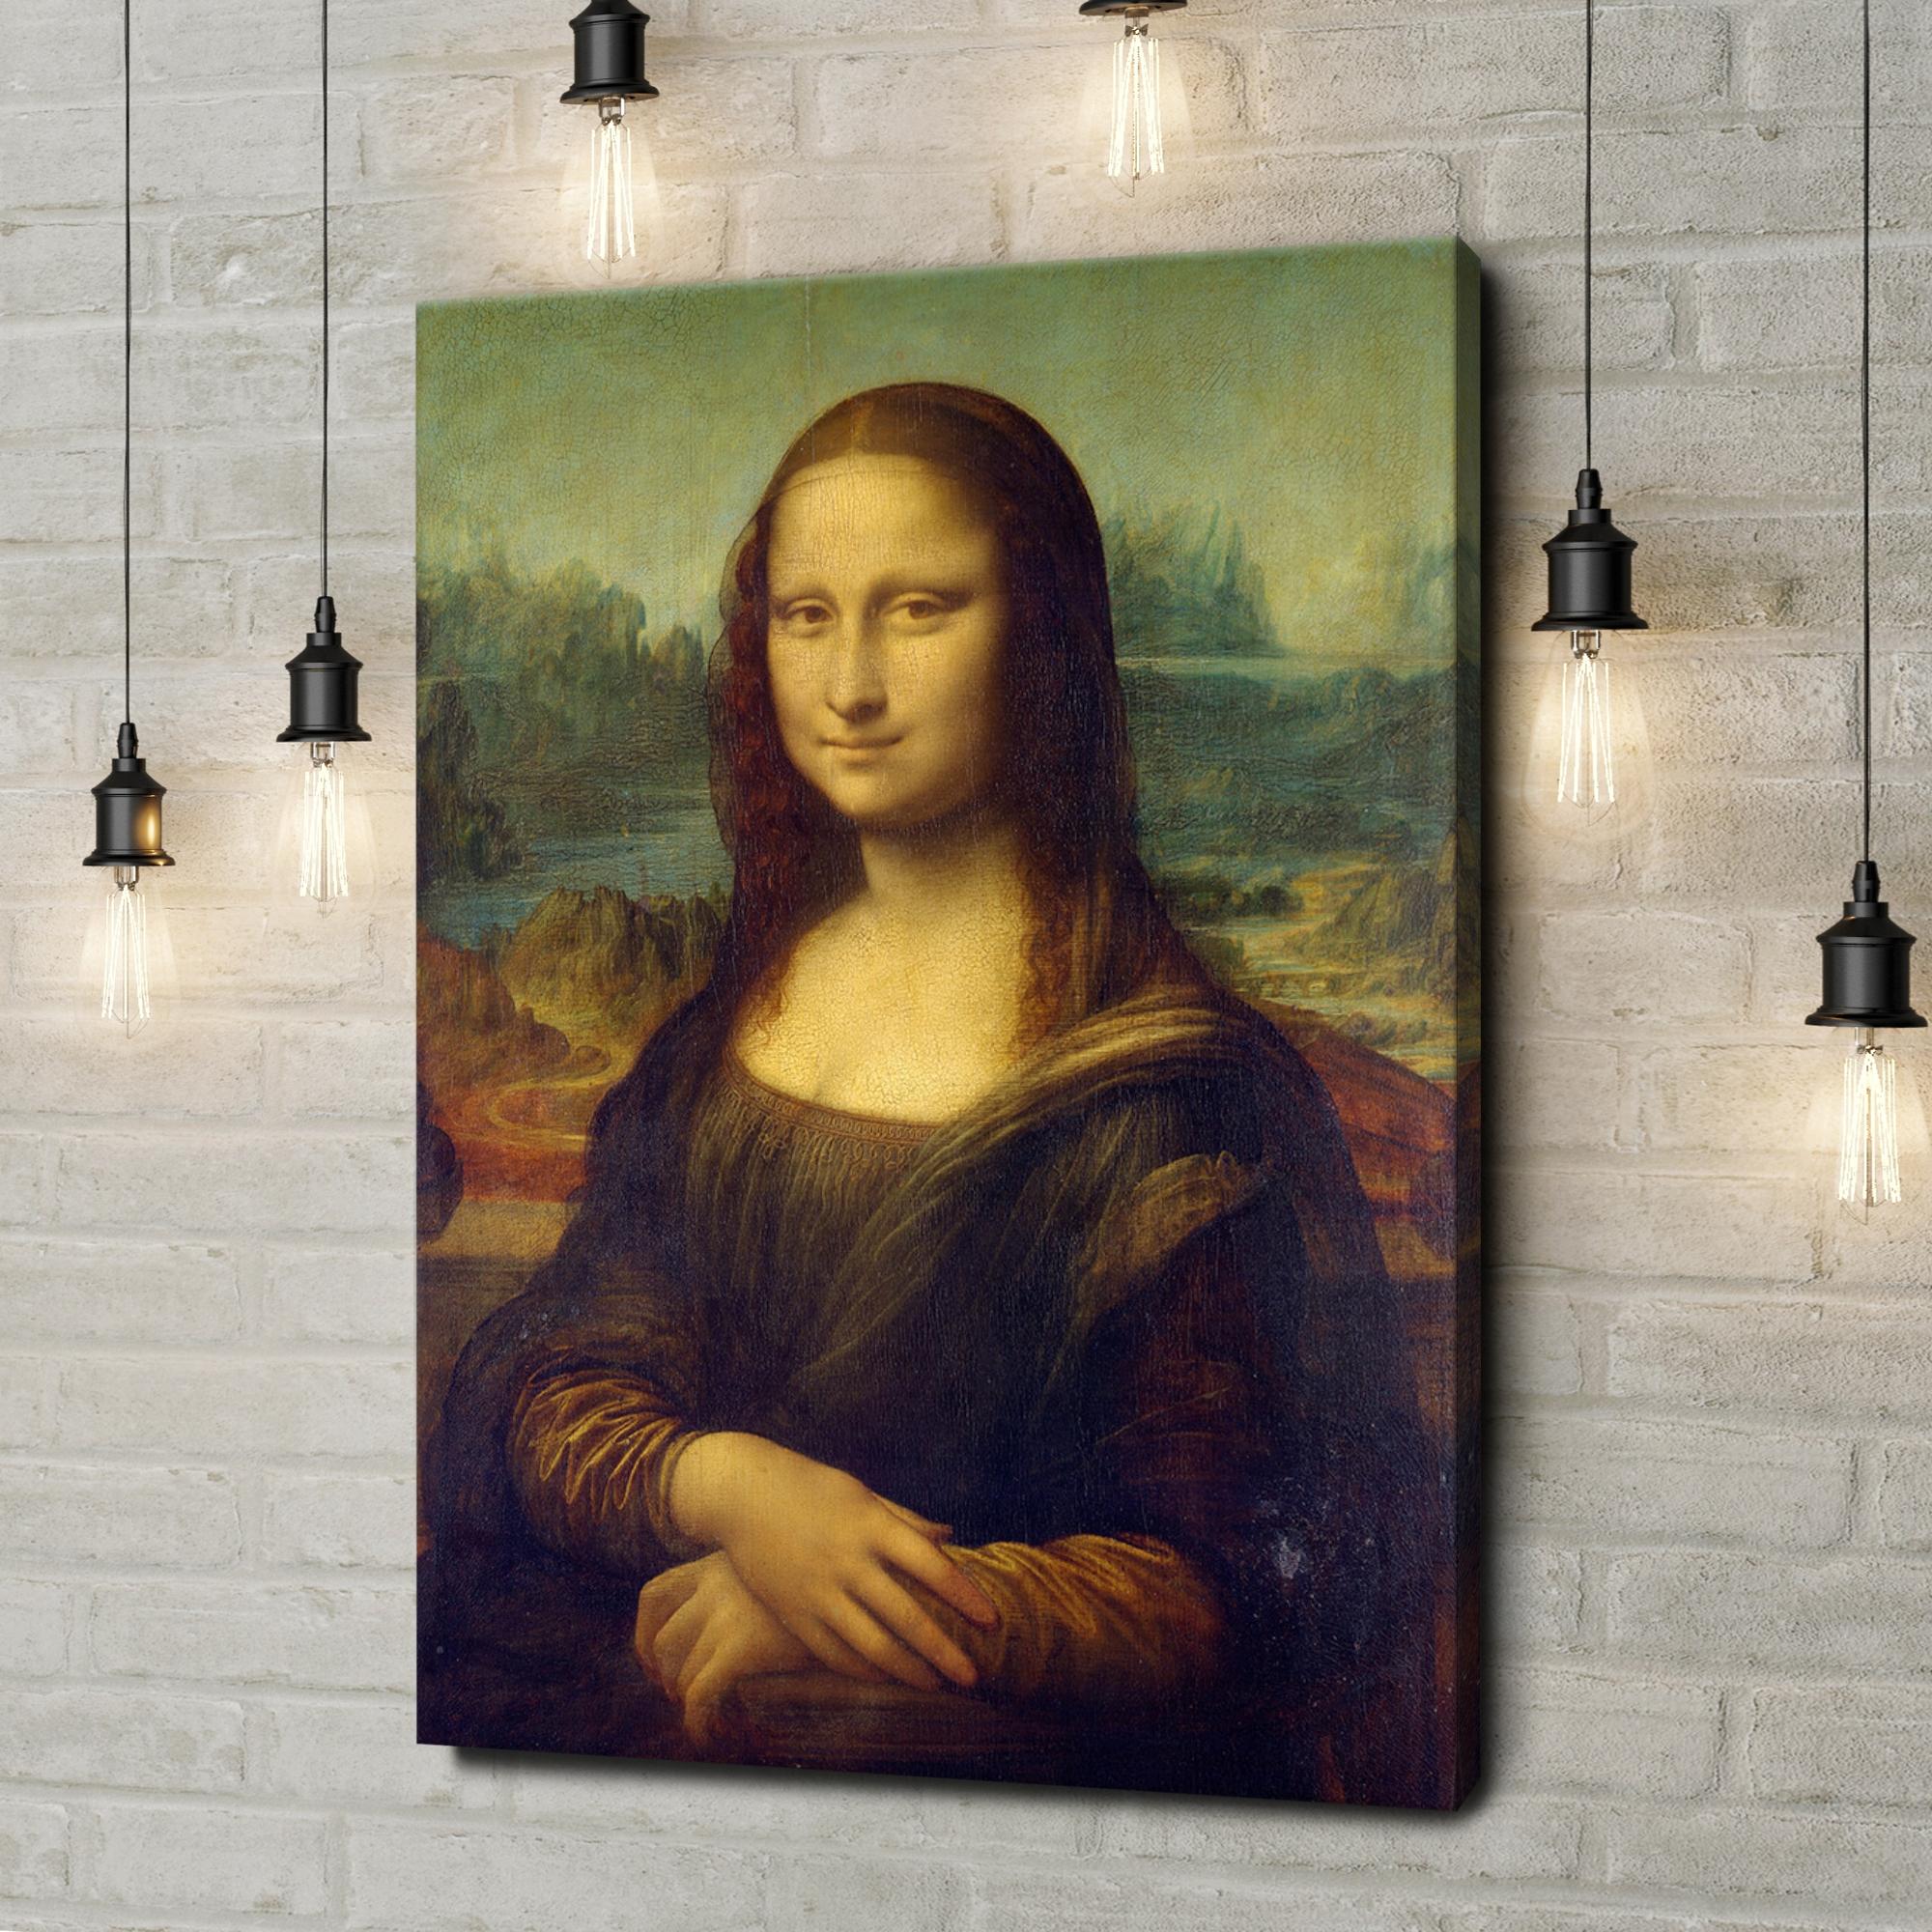 Leinwandbild personalisiert Mona Lisa